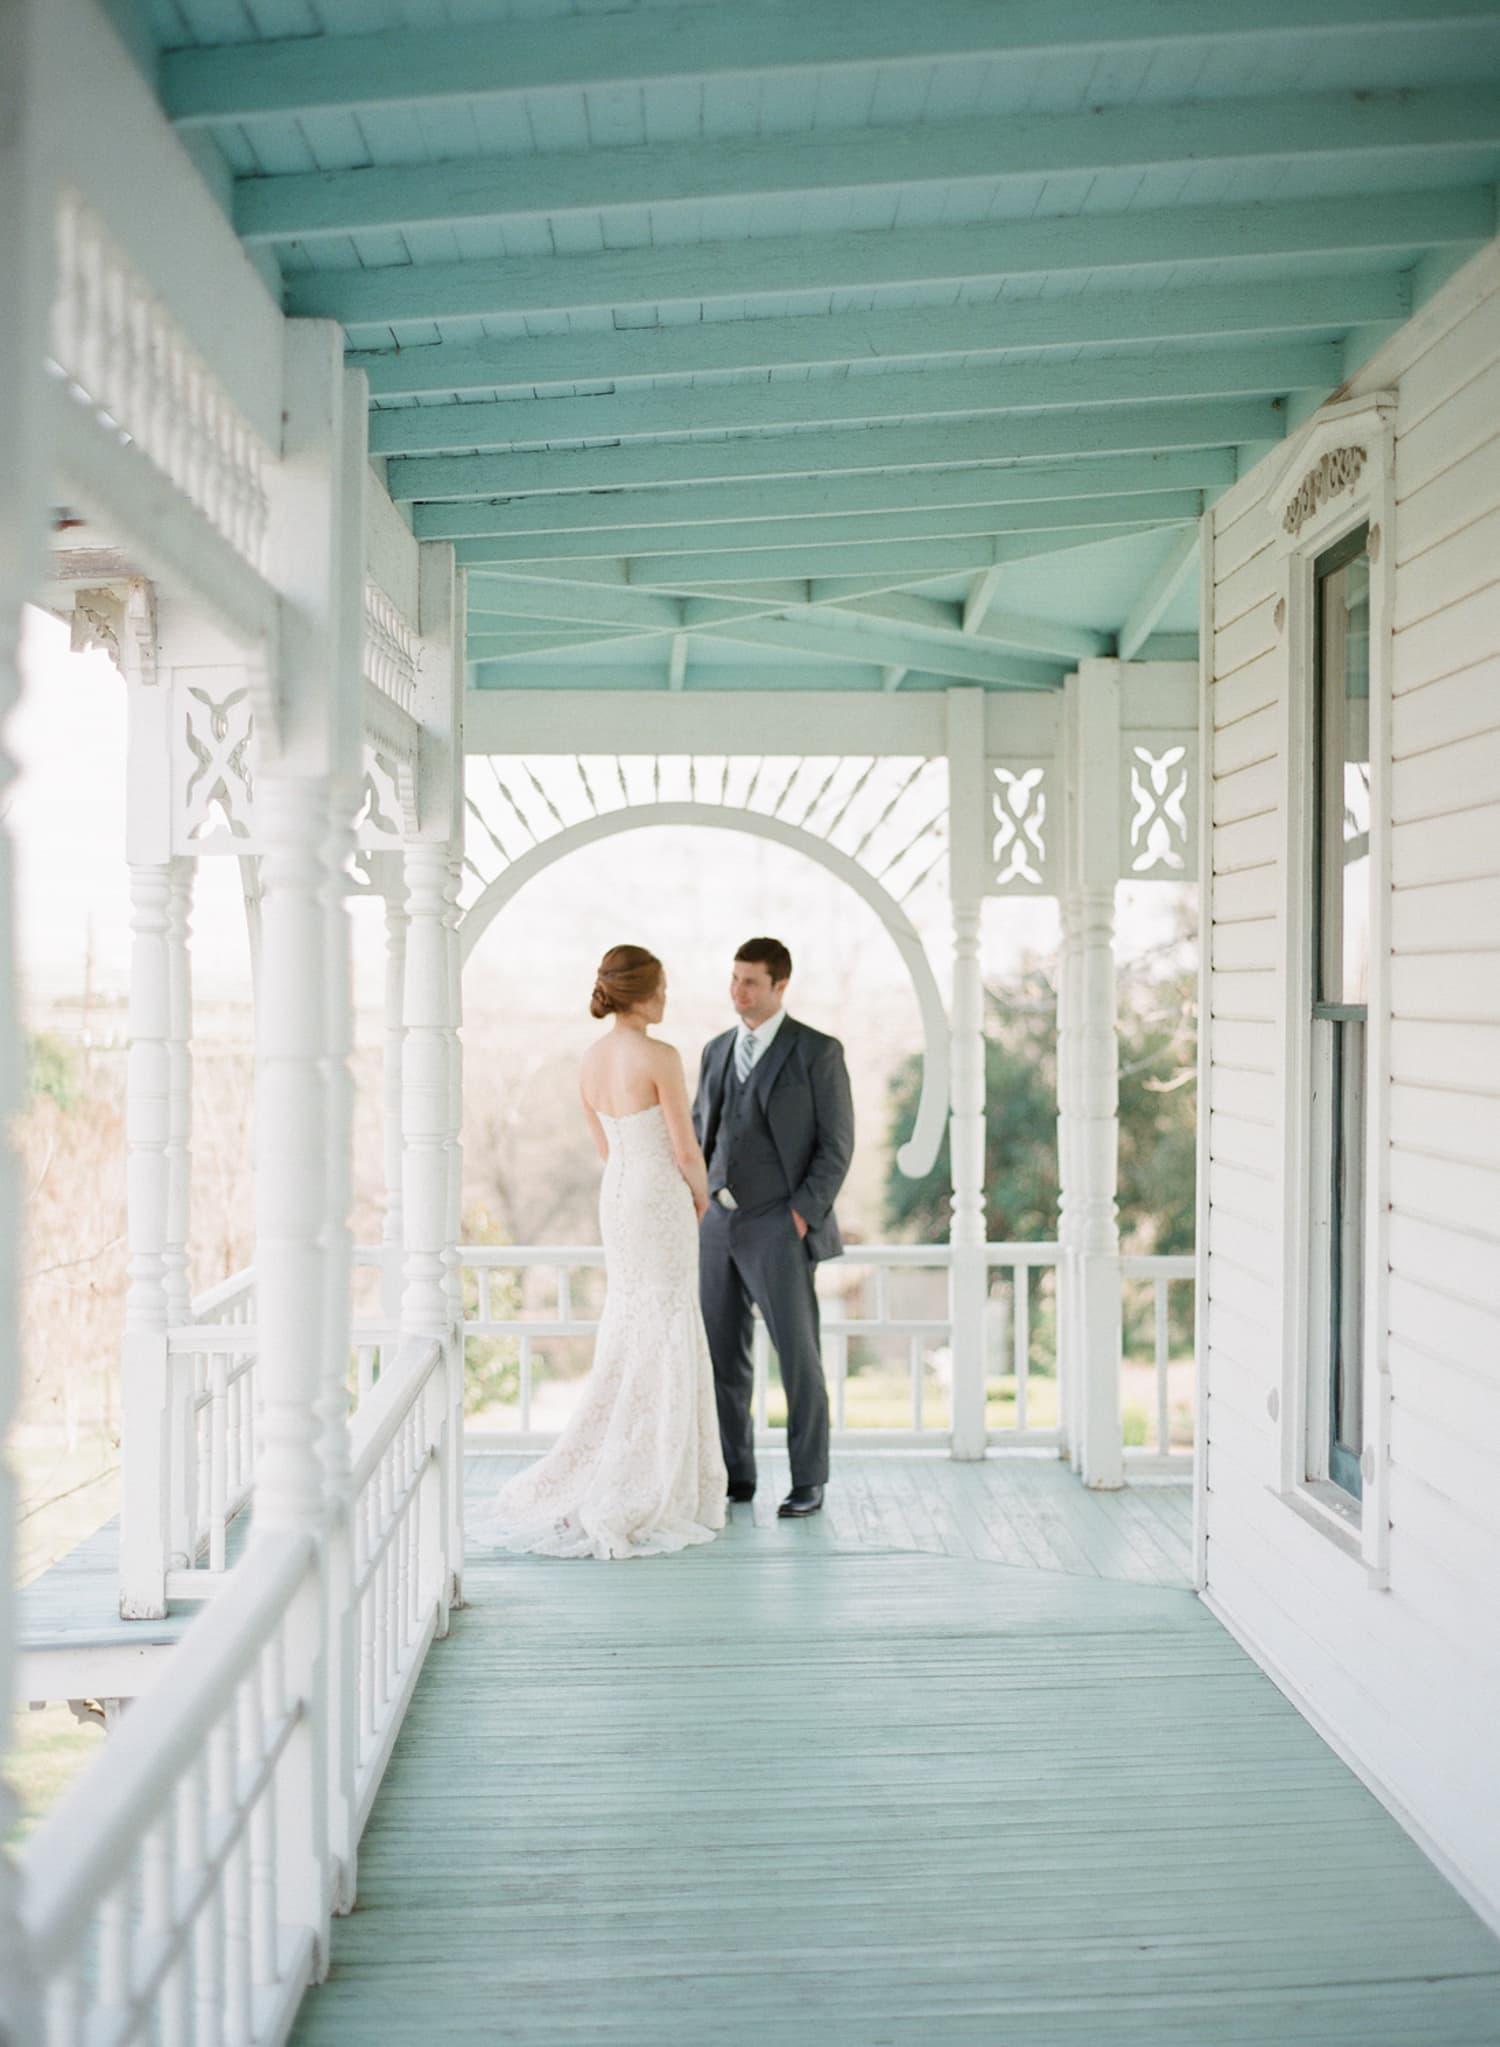 barr-mansion-wedding-40.jpg